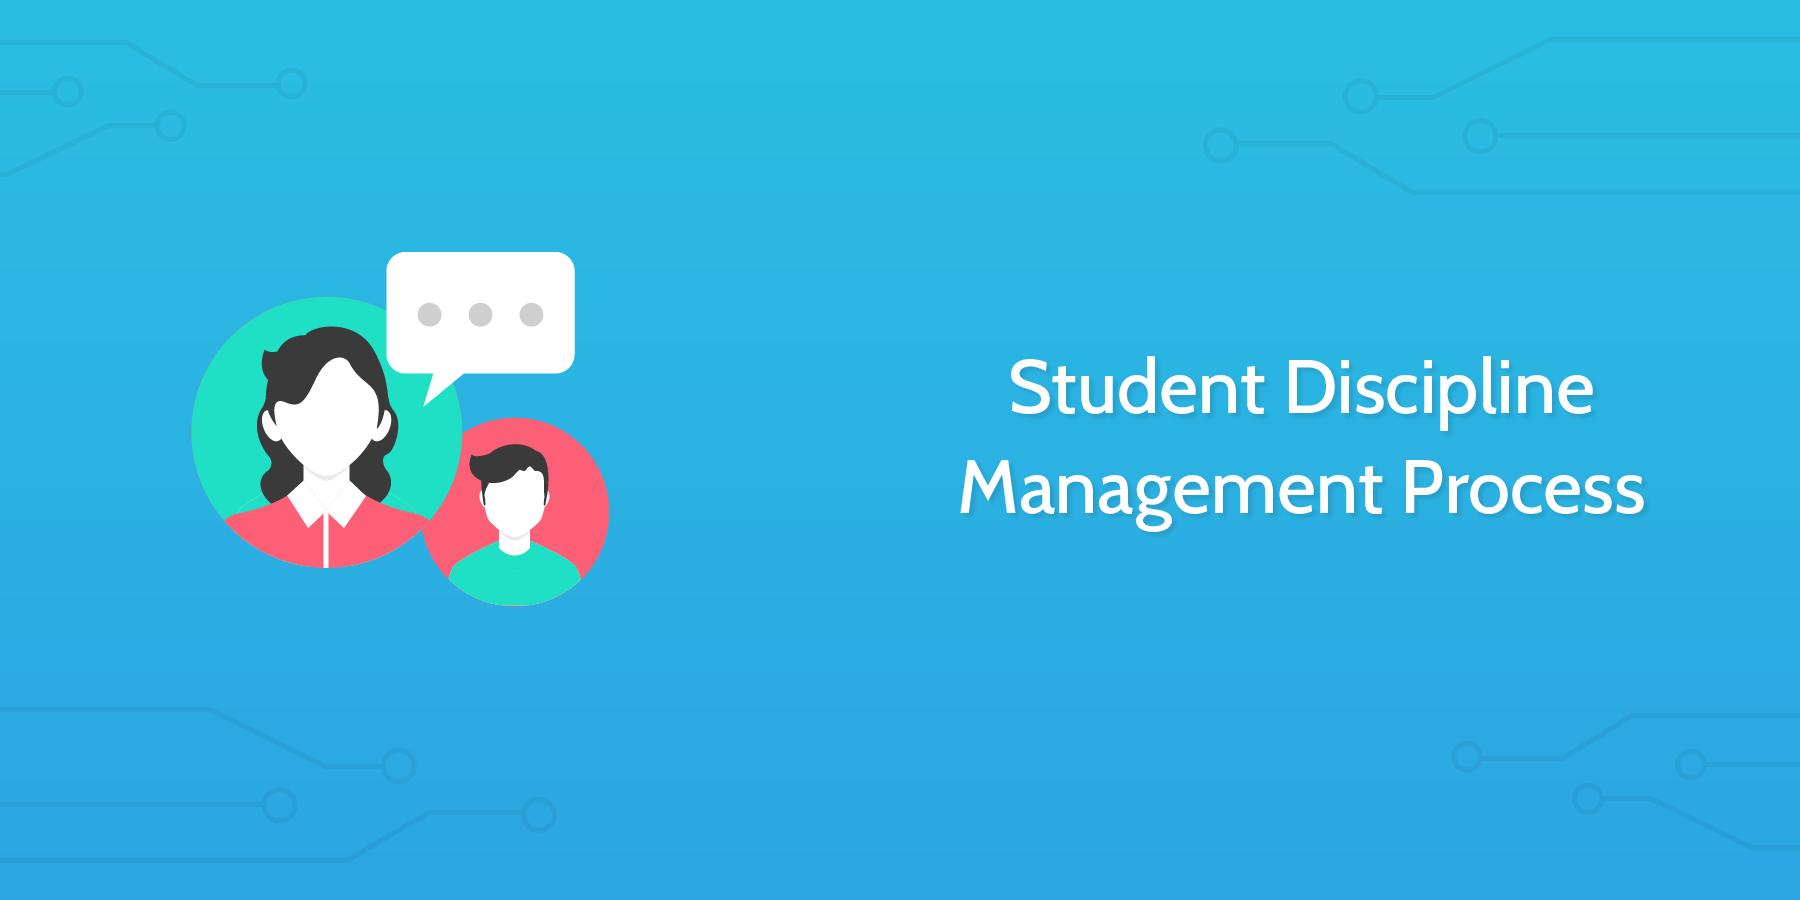 Student Discipline Management Process - Process Street